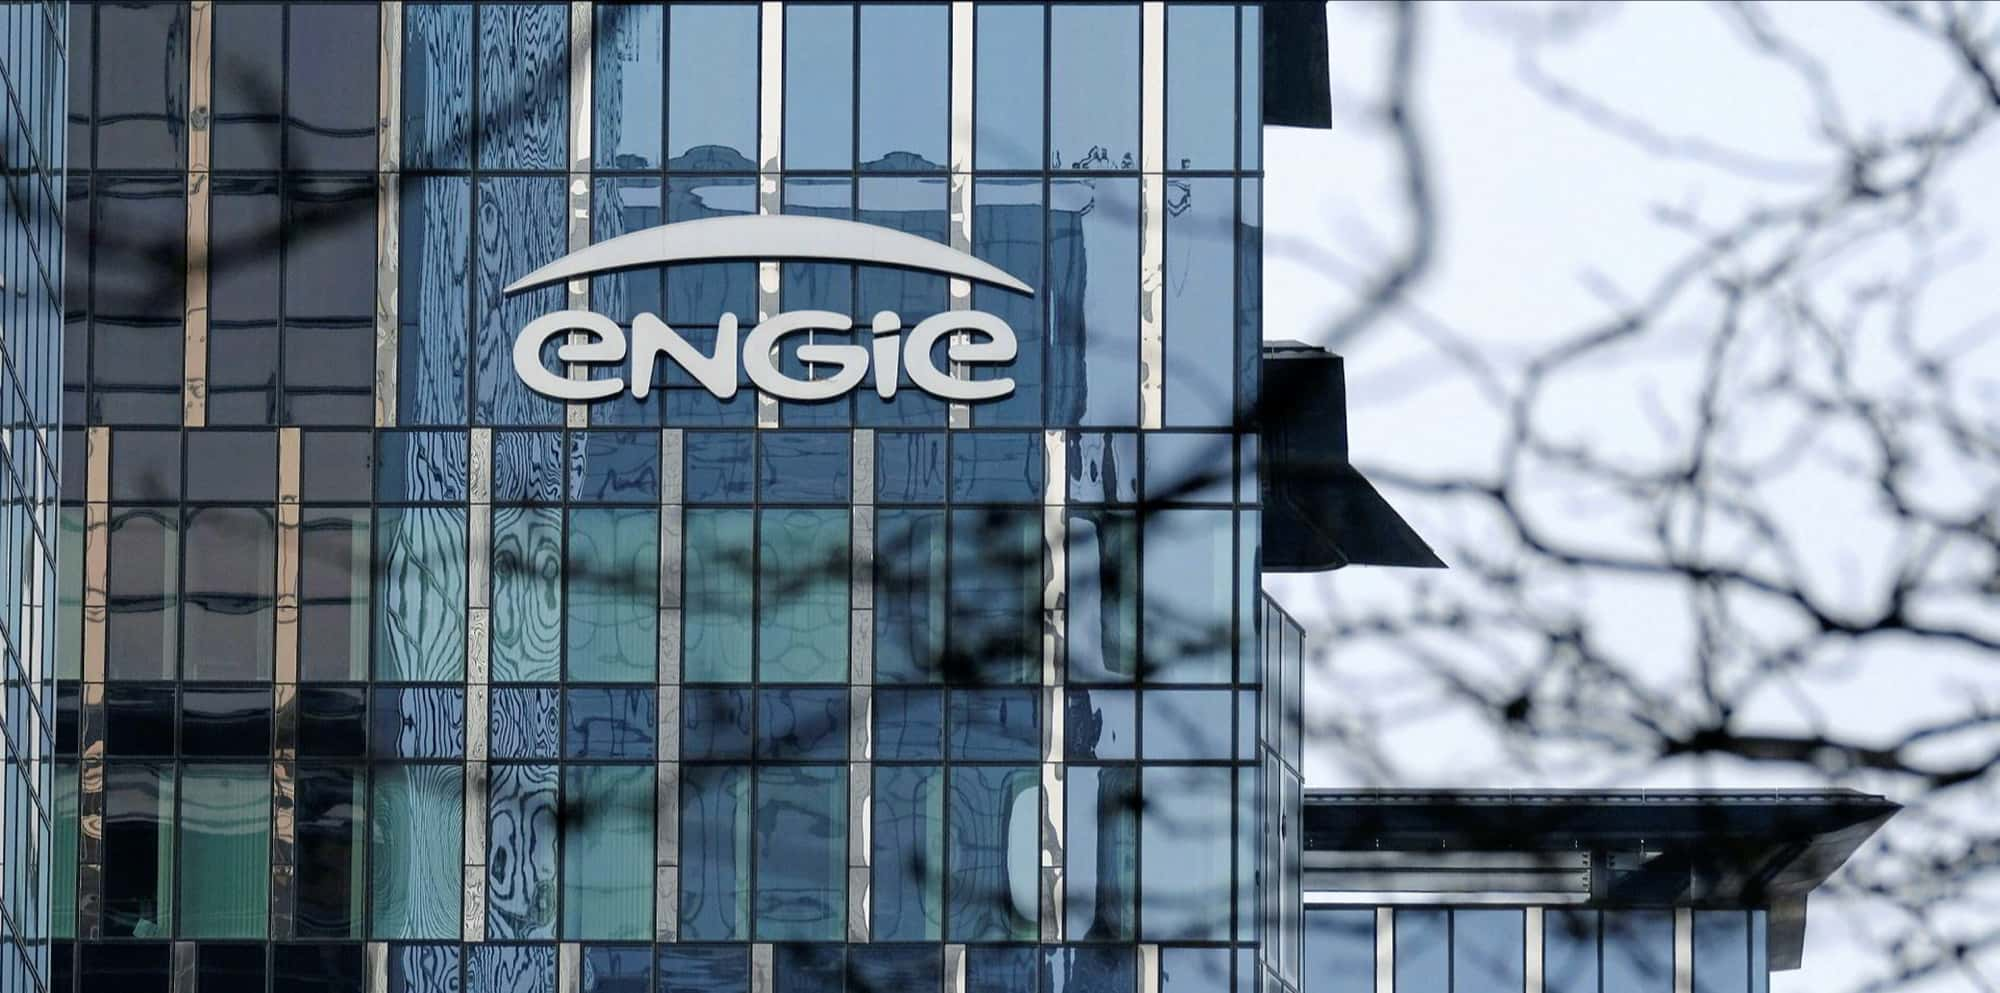 ENGIE building